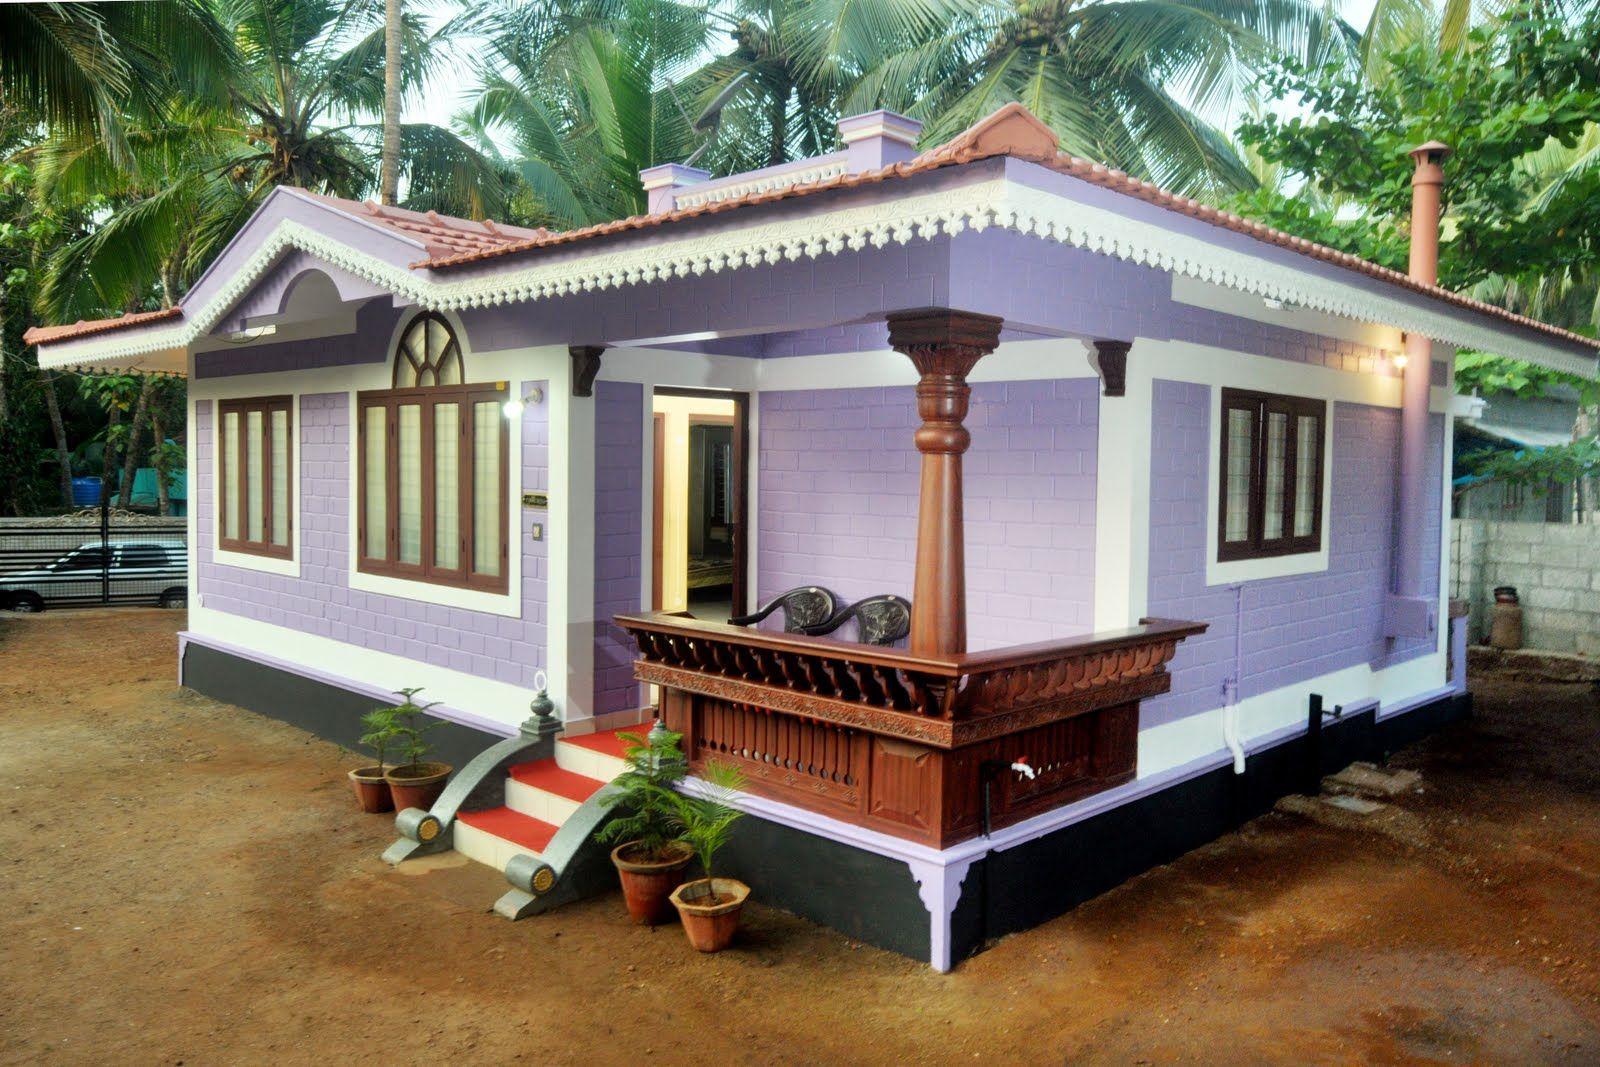 aa97d3fddc1ca4a430edf40317b17d15 - 26+ Small House Plans For Kerala  PNG